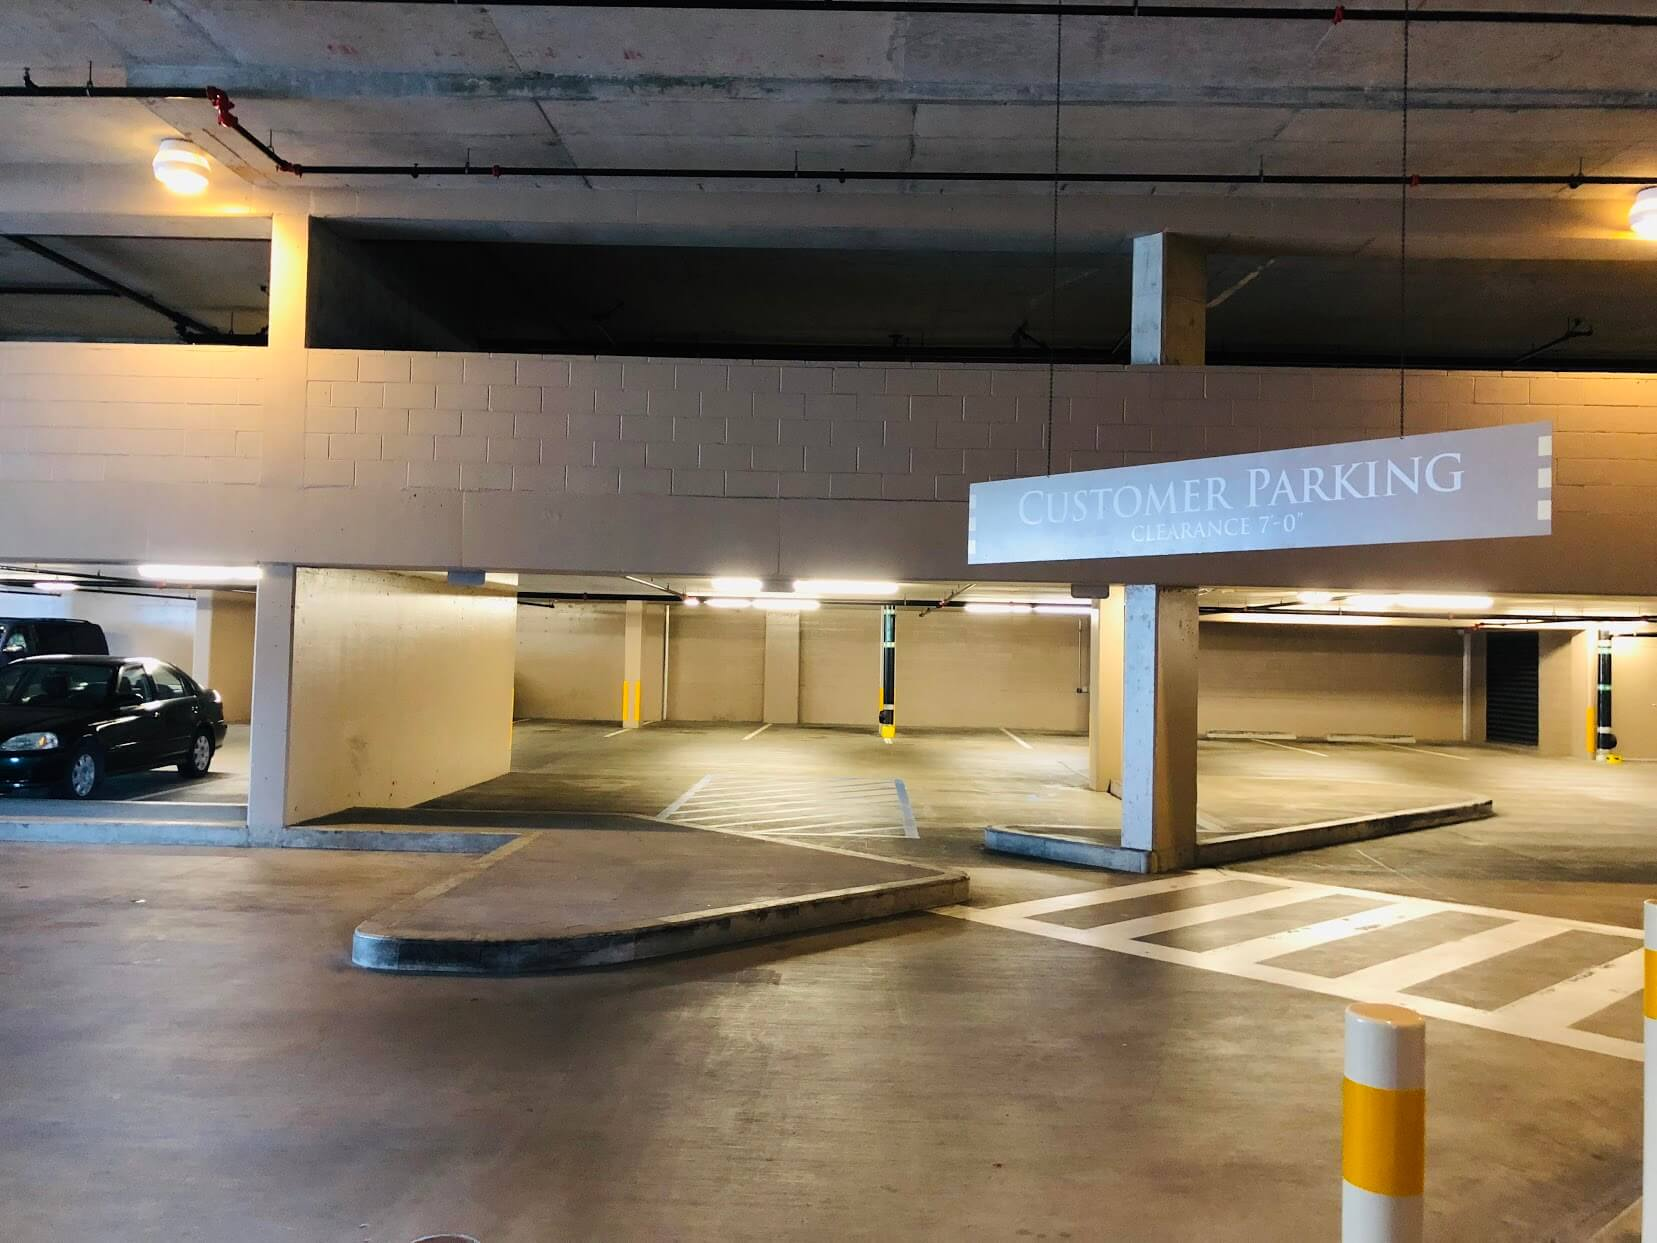 Keola Laiの駐車場